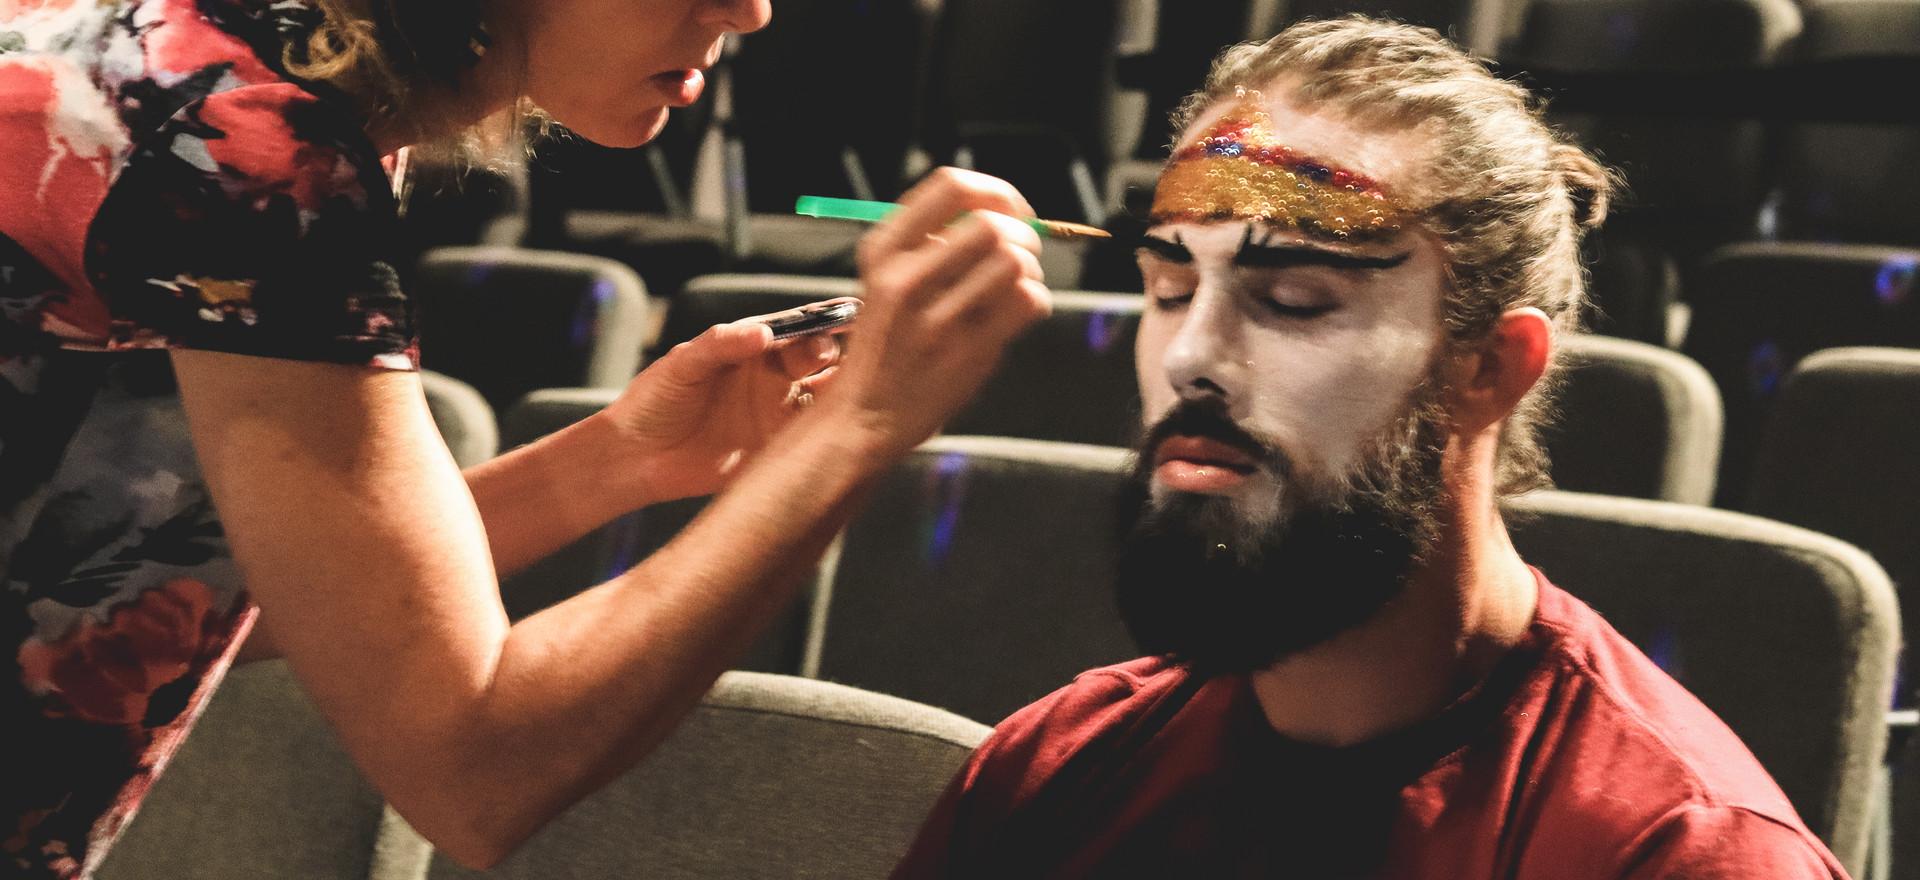 Behind the scenes w/The Durango Circus 2018